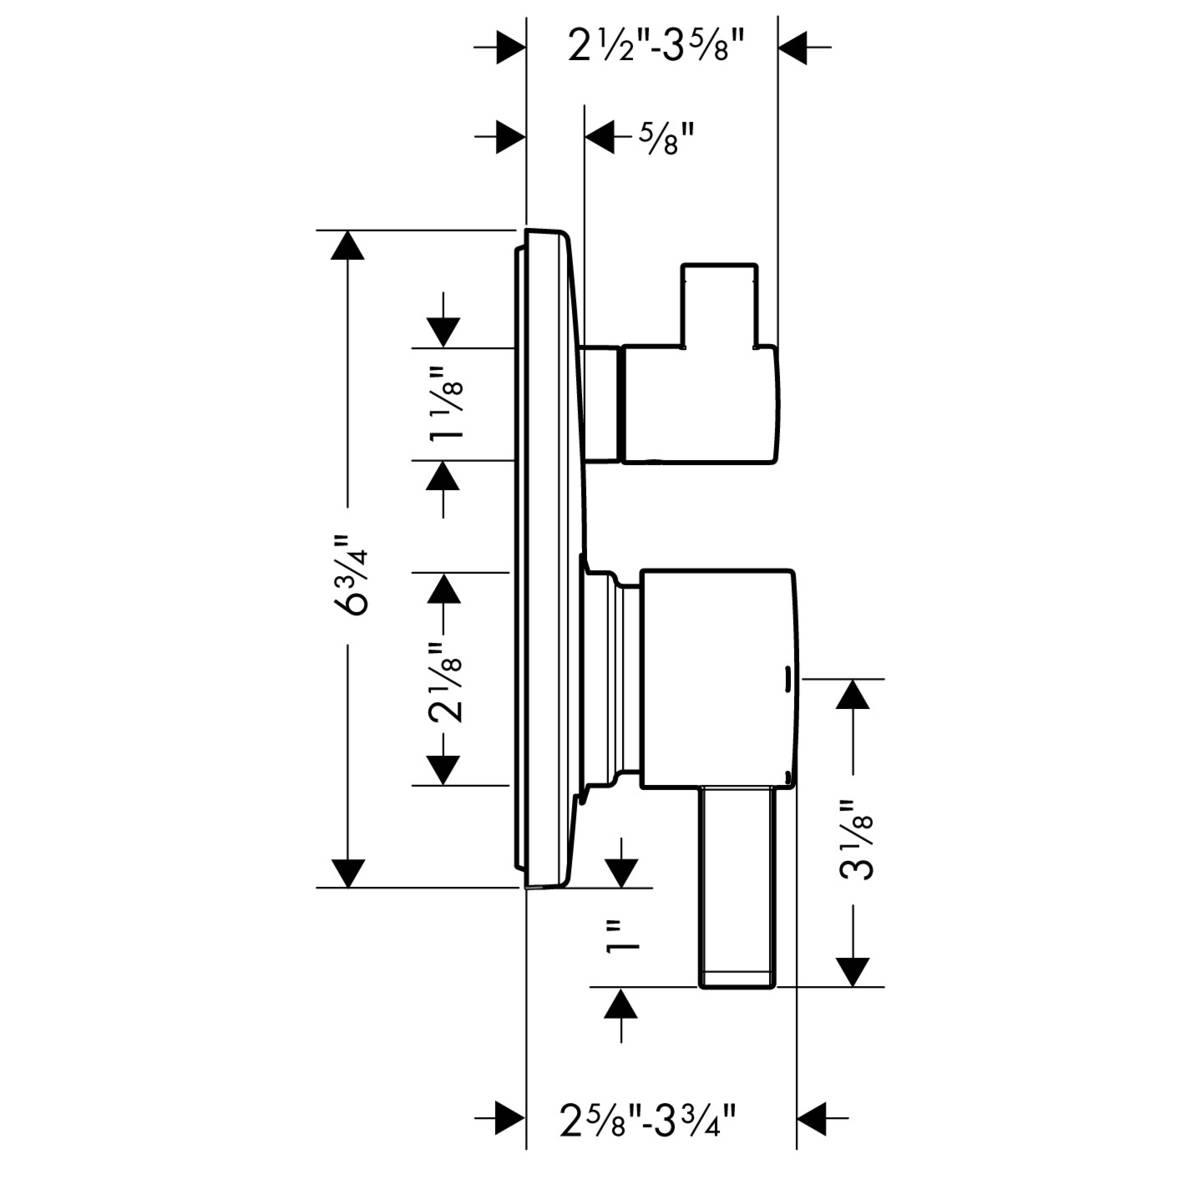 national plumbing code of canada 2010 pdf